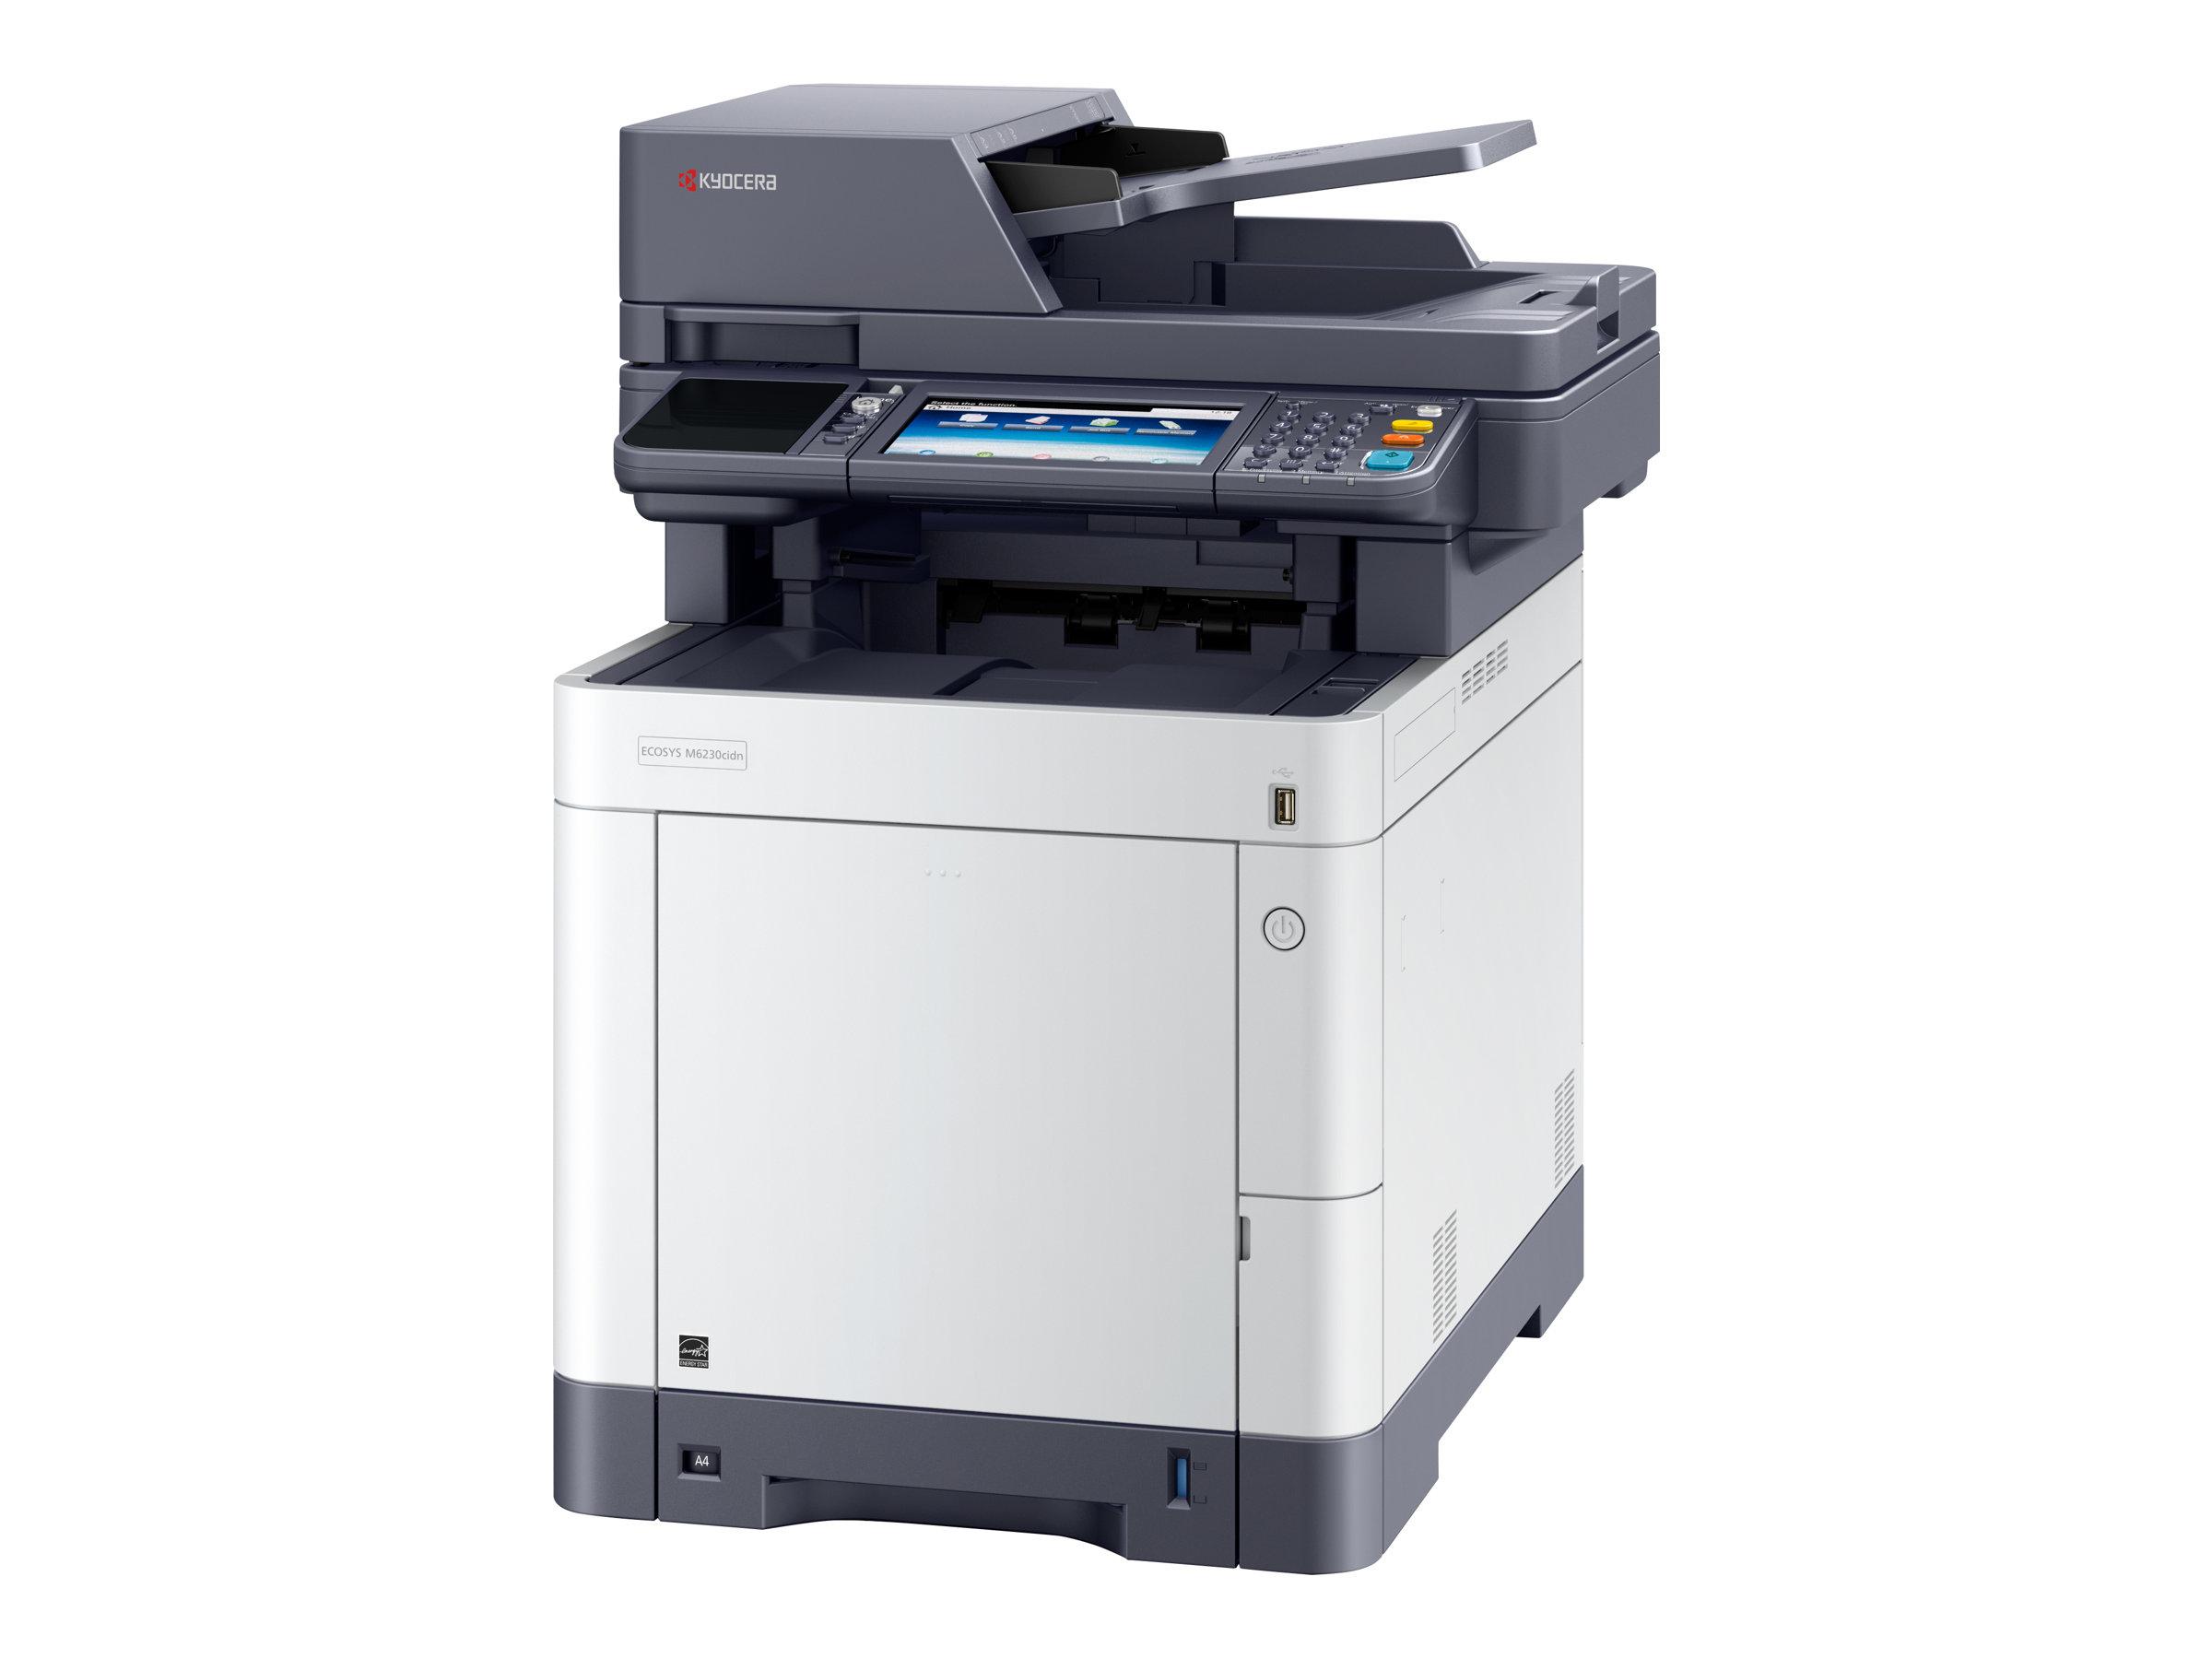 Kyocera ECOSYS M6230cidn - Multifunktionsdrucker - Farbe - Laser - Legal (216 x 356 mm)/A4 (210 x 297 mm) (Original) - A4/Legal